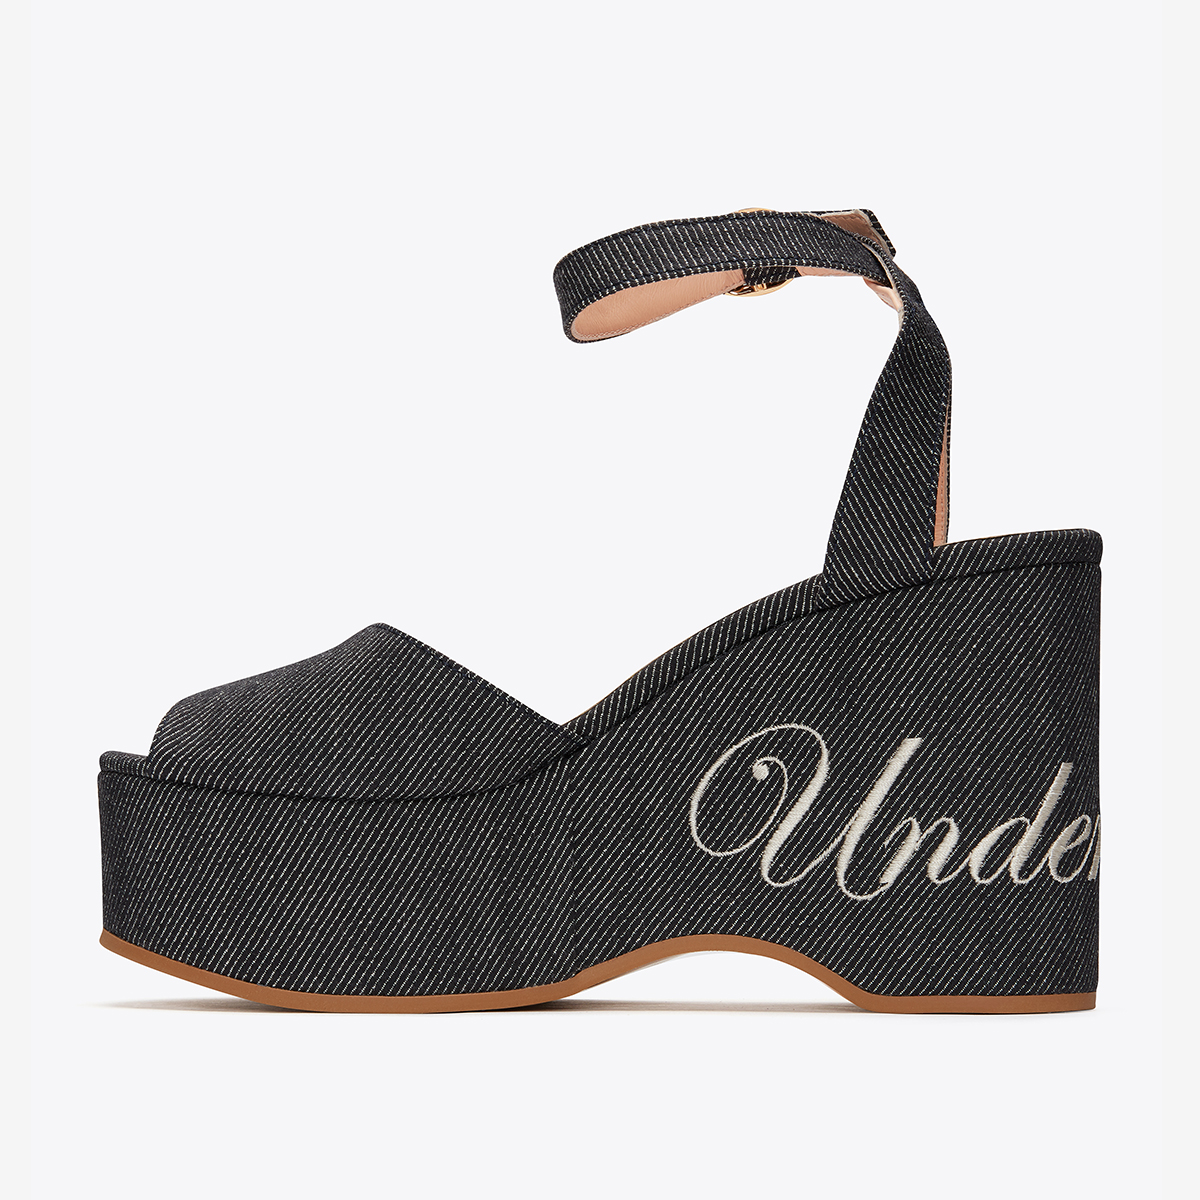 Valentino undercover women's shoe in grey